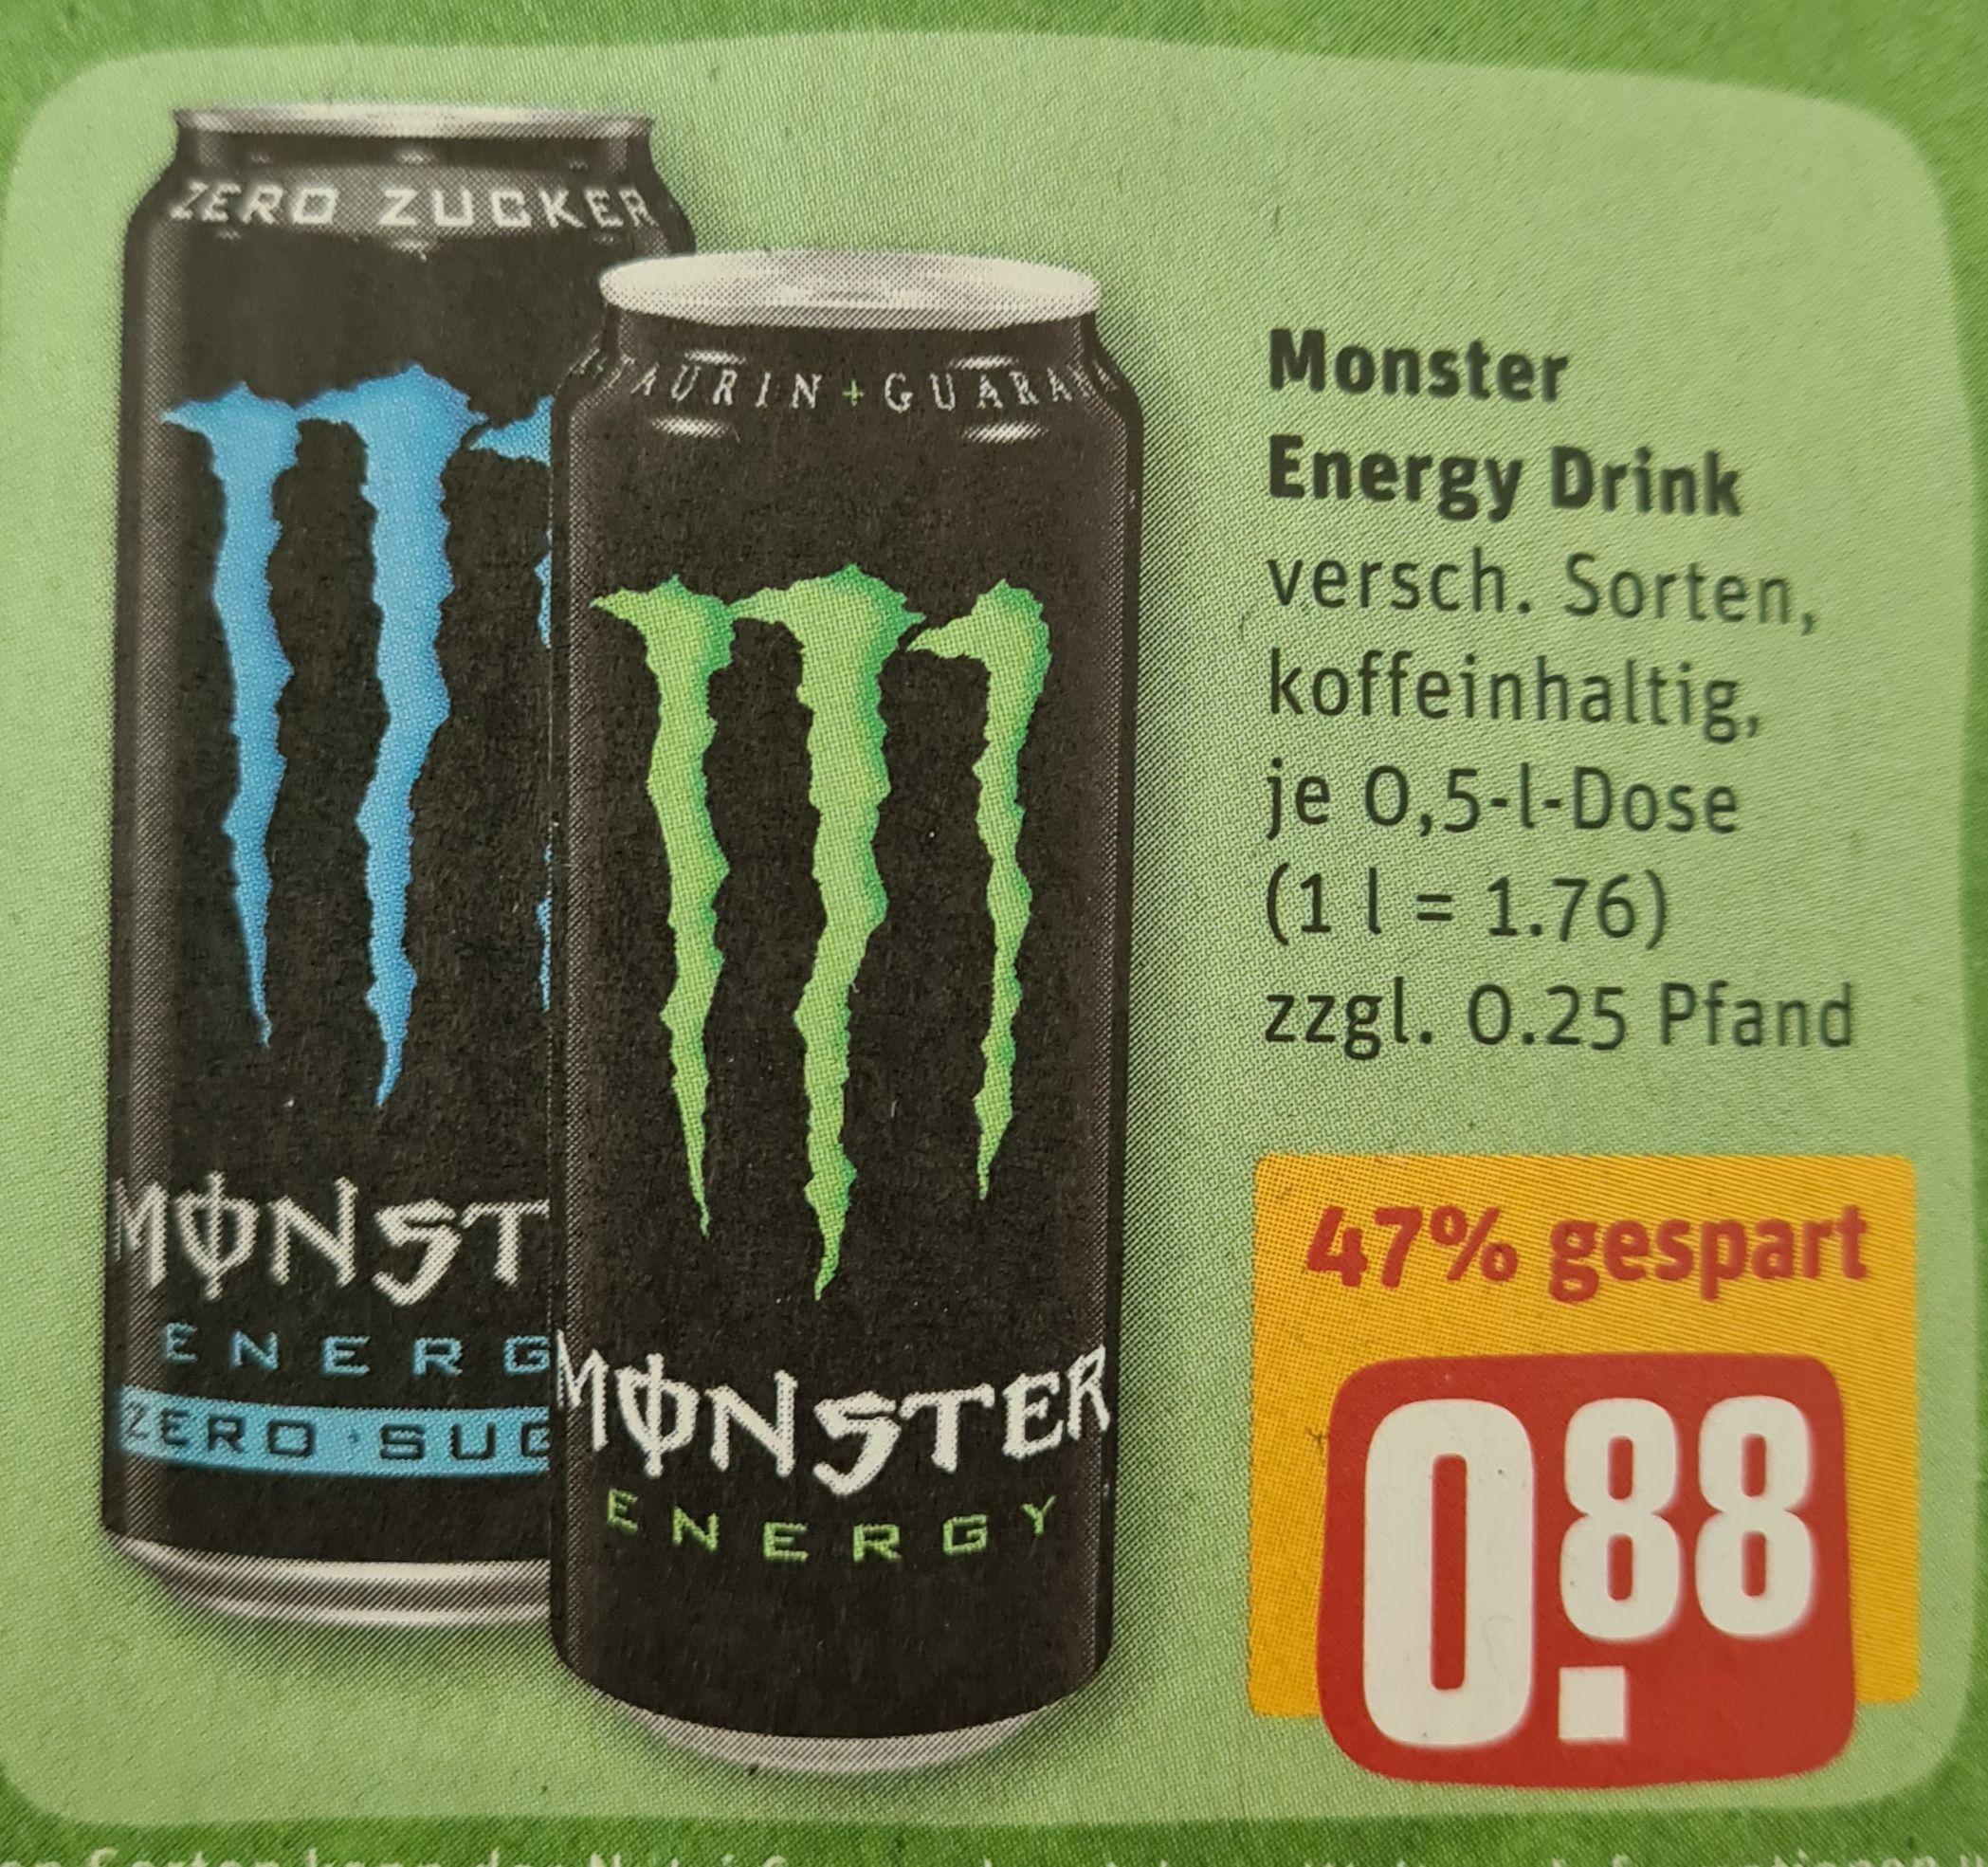 [Rewe] Monster Energy Drink, diverse Sorten, 0,88€ pro Dose zzgl. Pfand